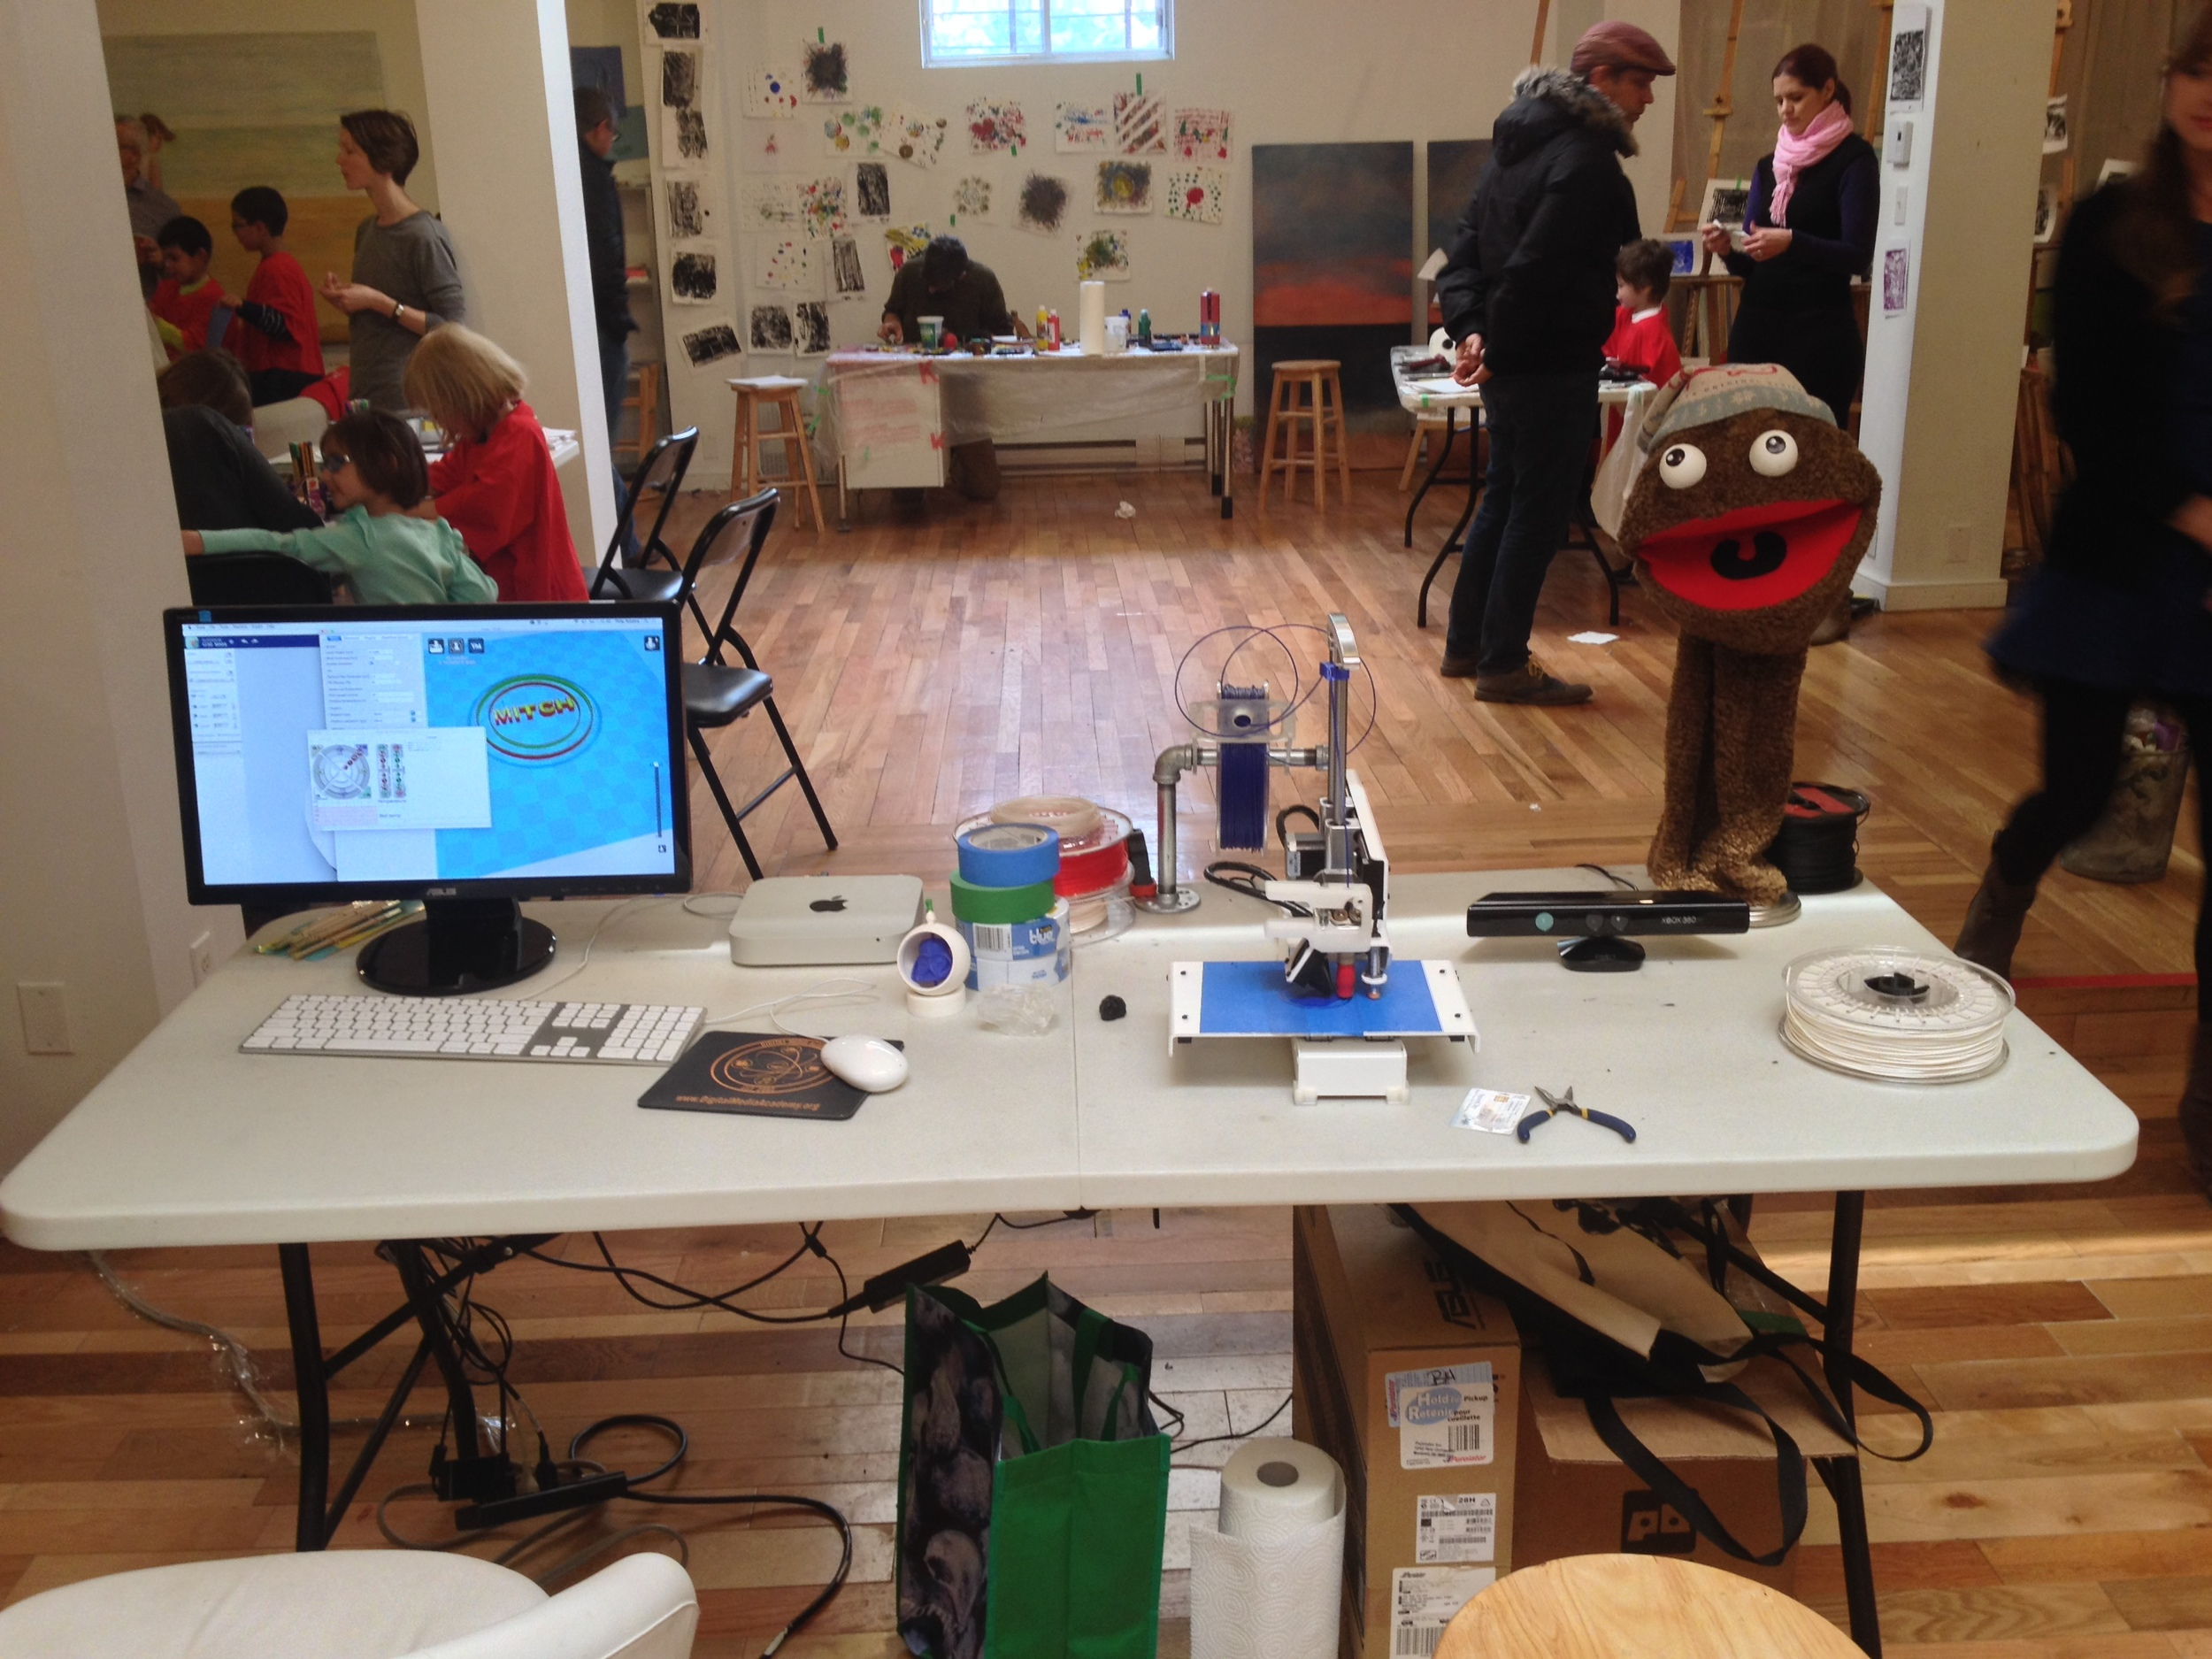 Tabletop Makerspace, 2015